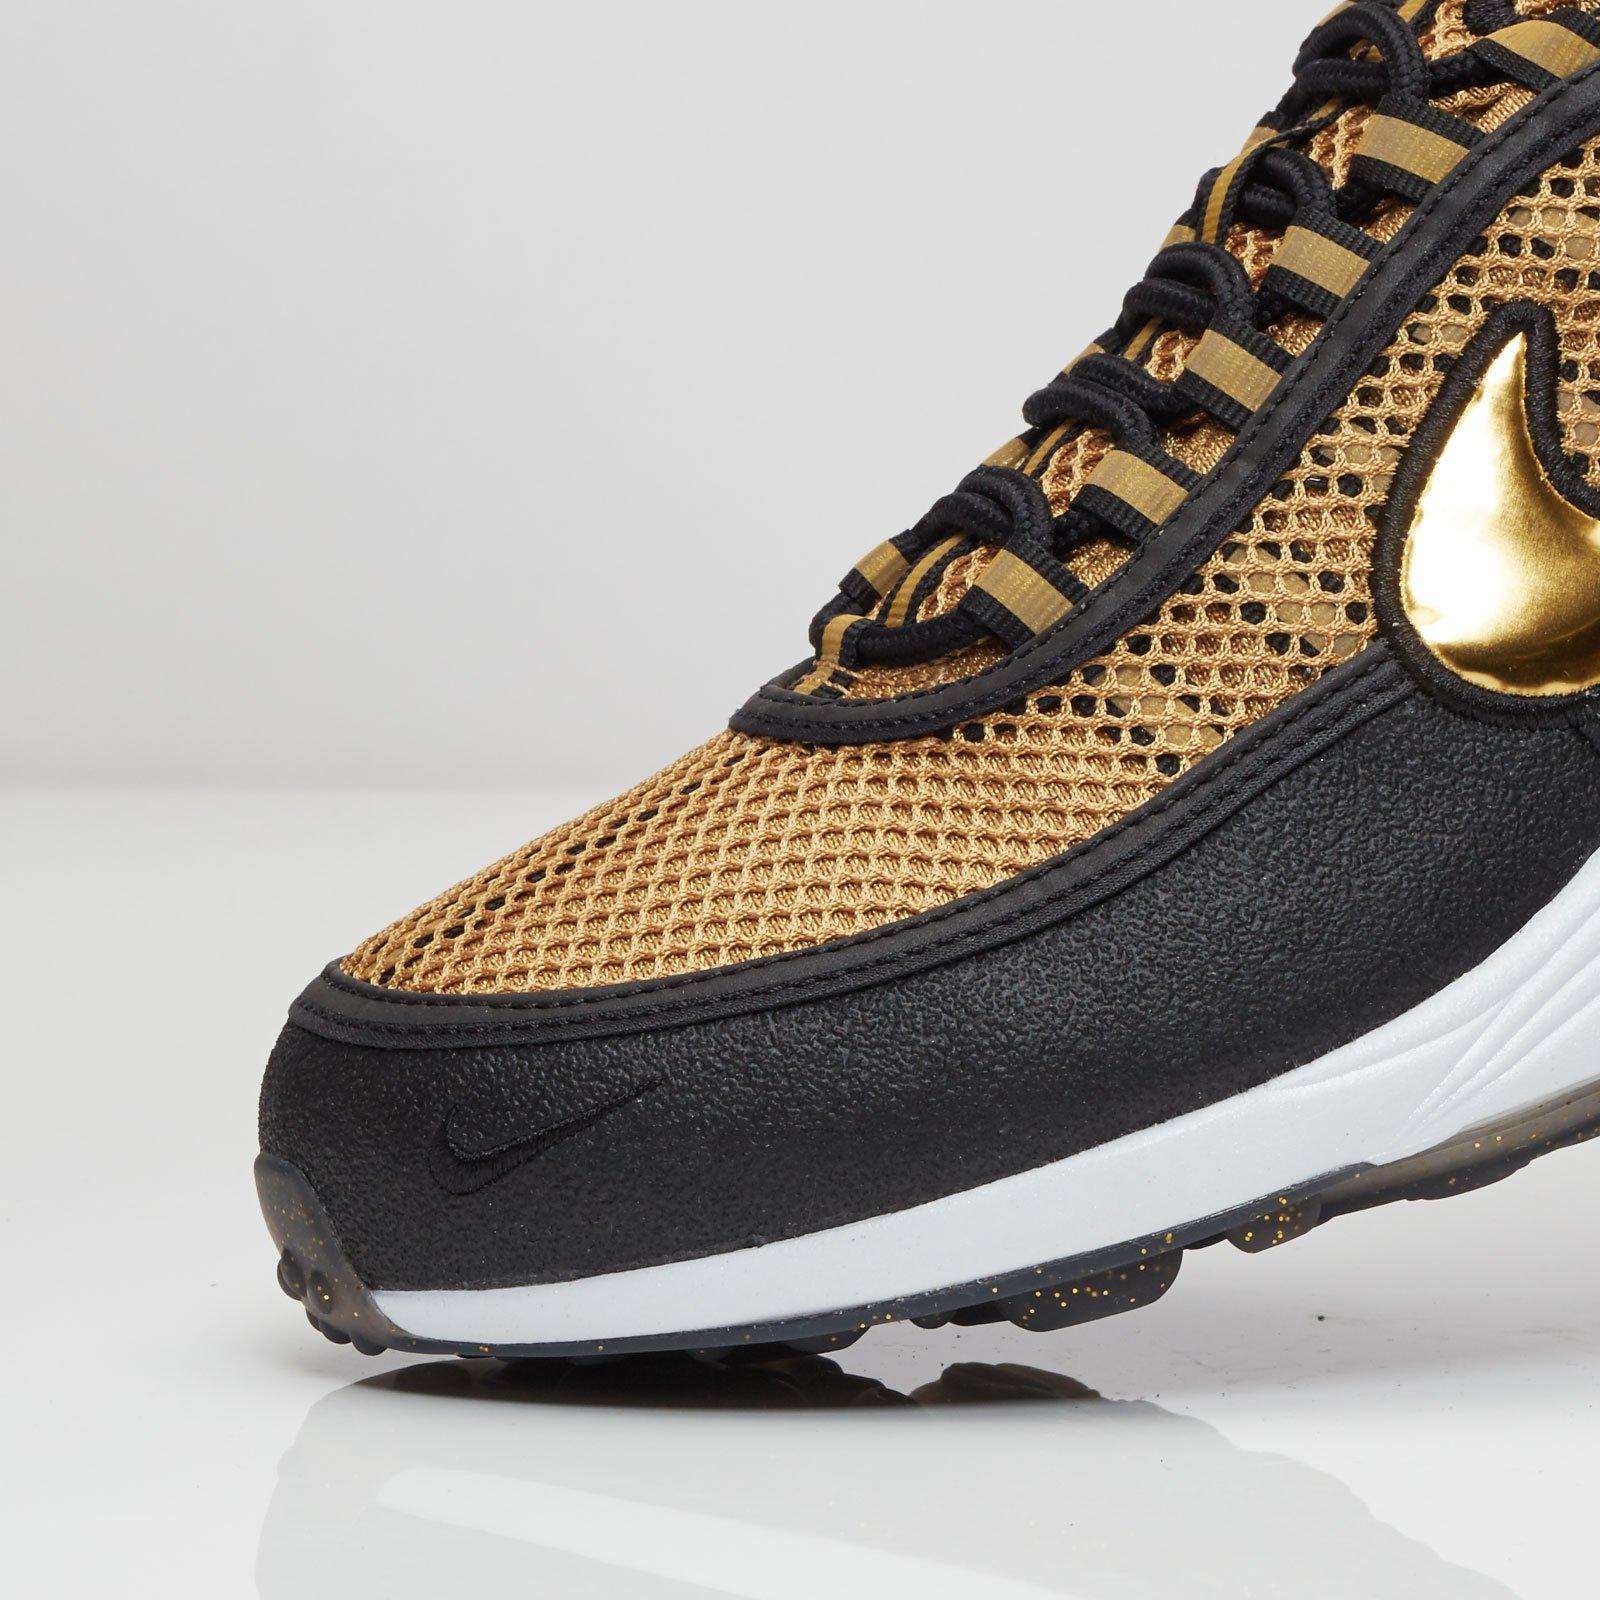 733f42c8ed44 Nike Air Zoom Spiridon - 849776-770 - Sneakersnstuff